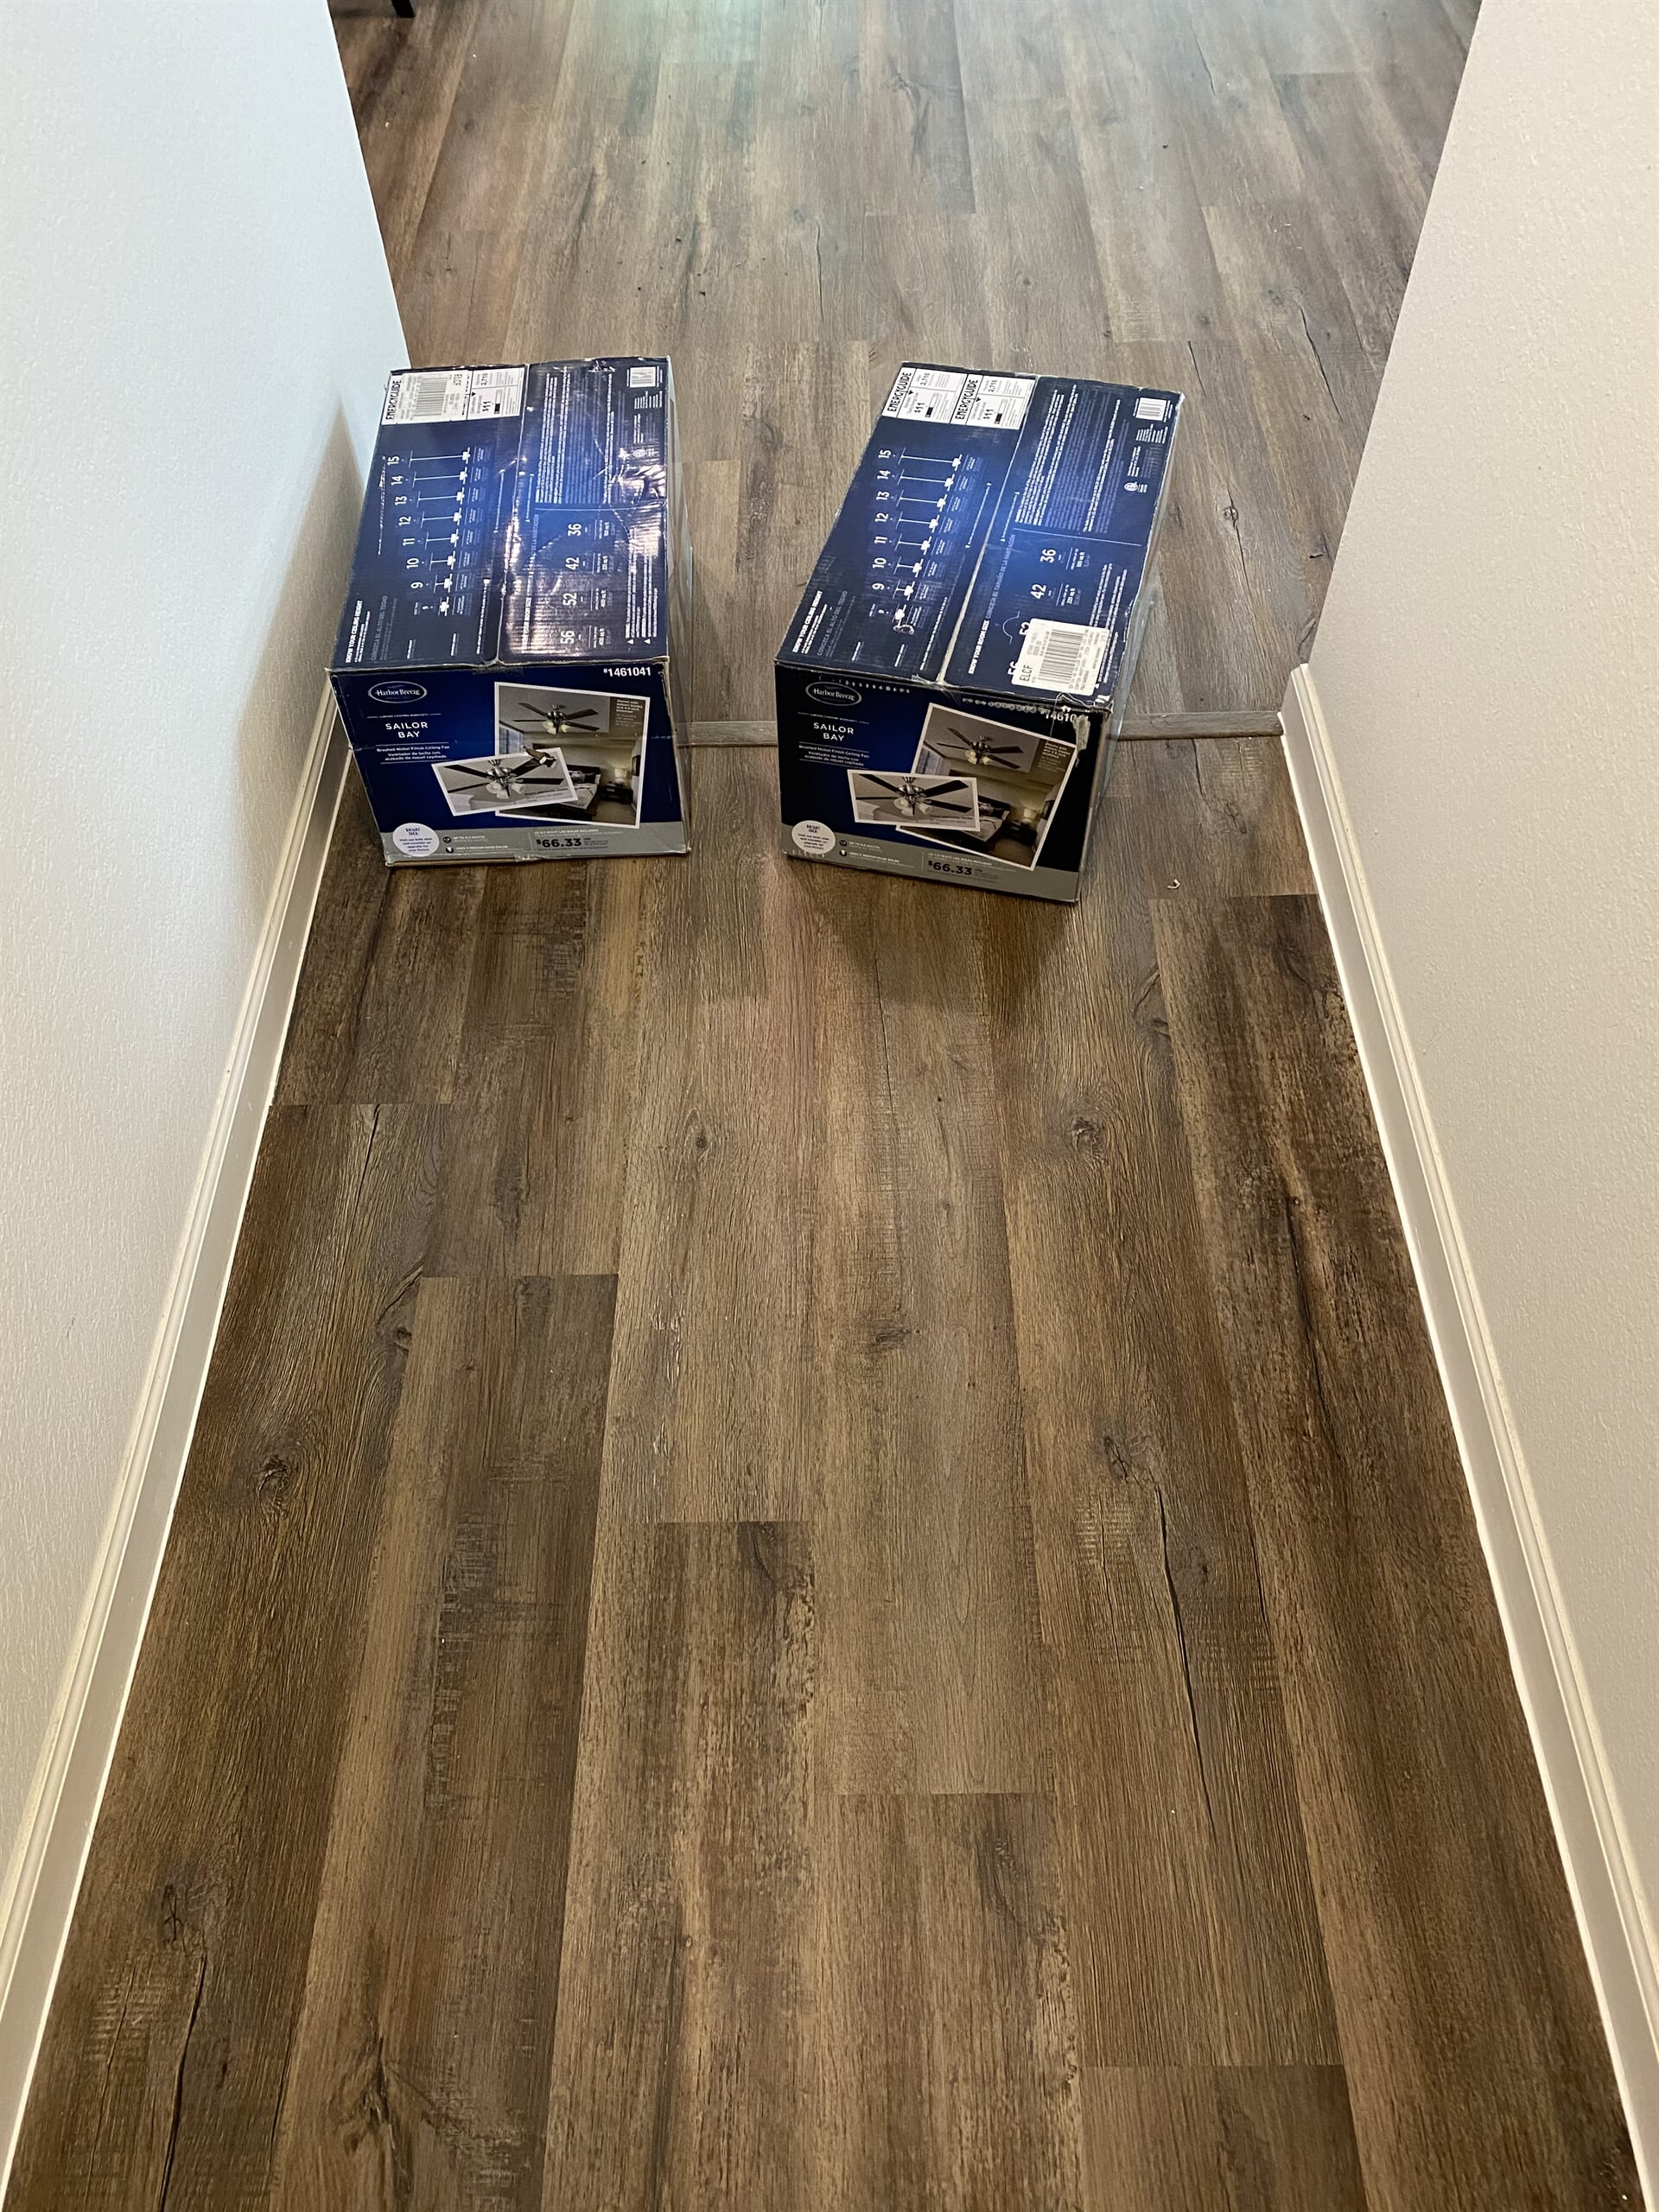 Waterproof flooring from Houston Floor Installation Services in Houston, TX